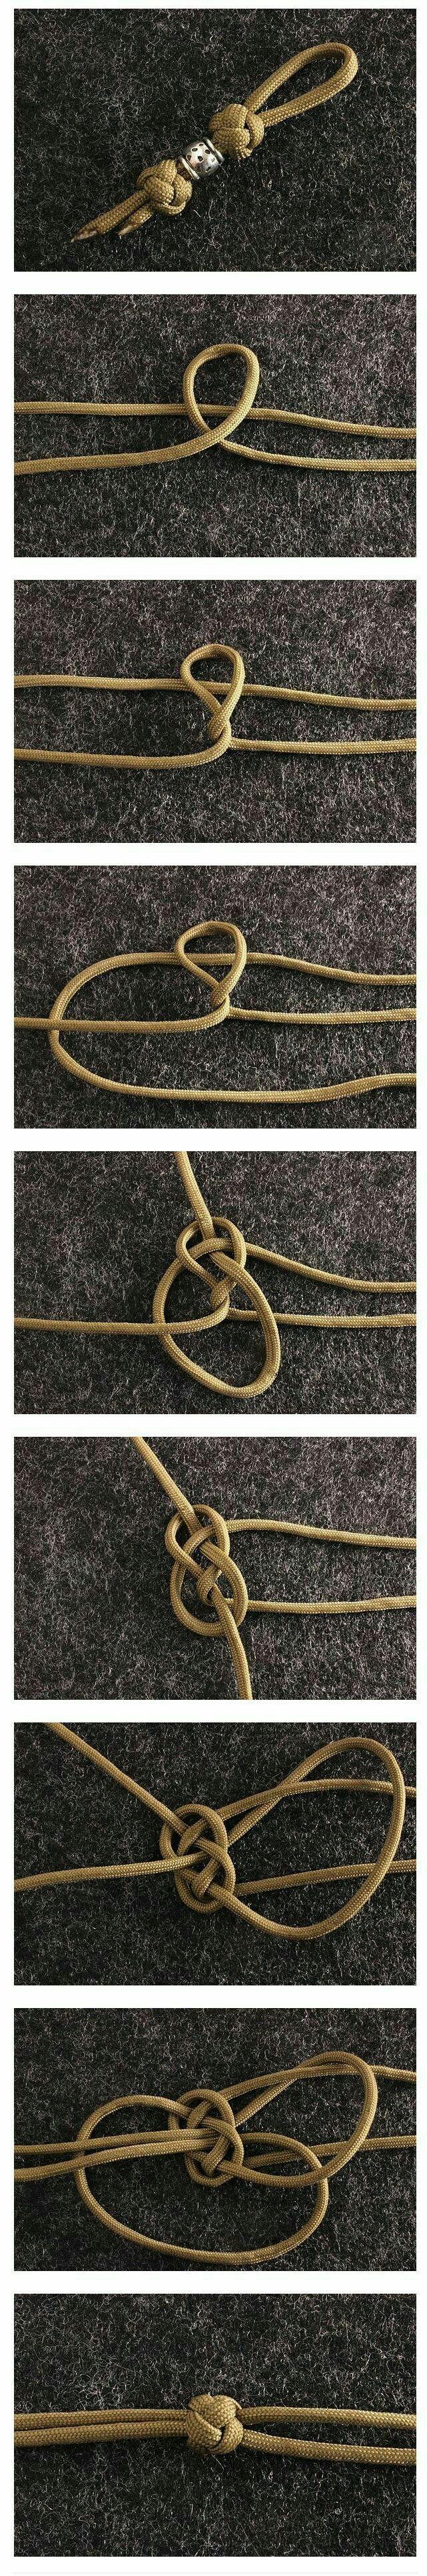 Add a cool slide for a zipper pull.